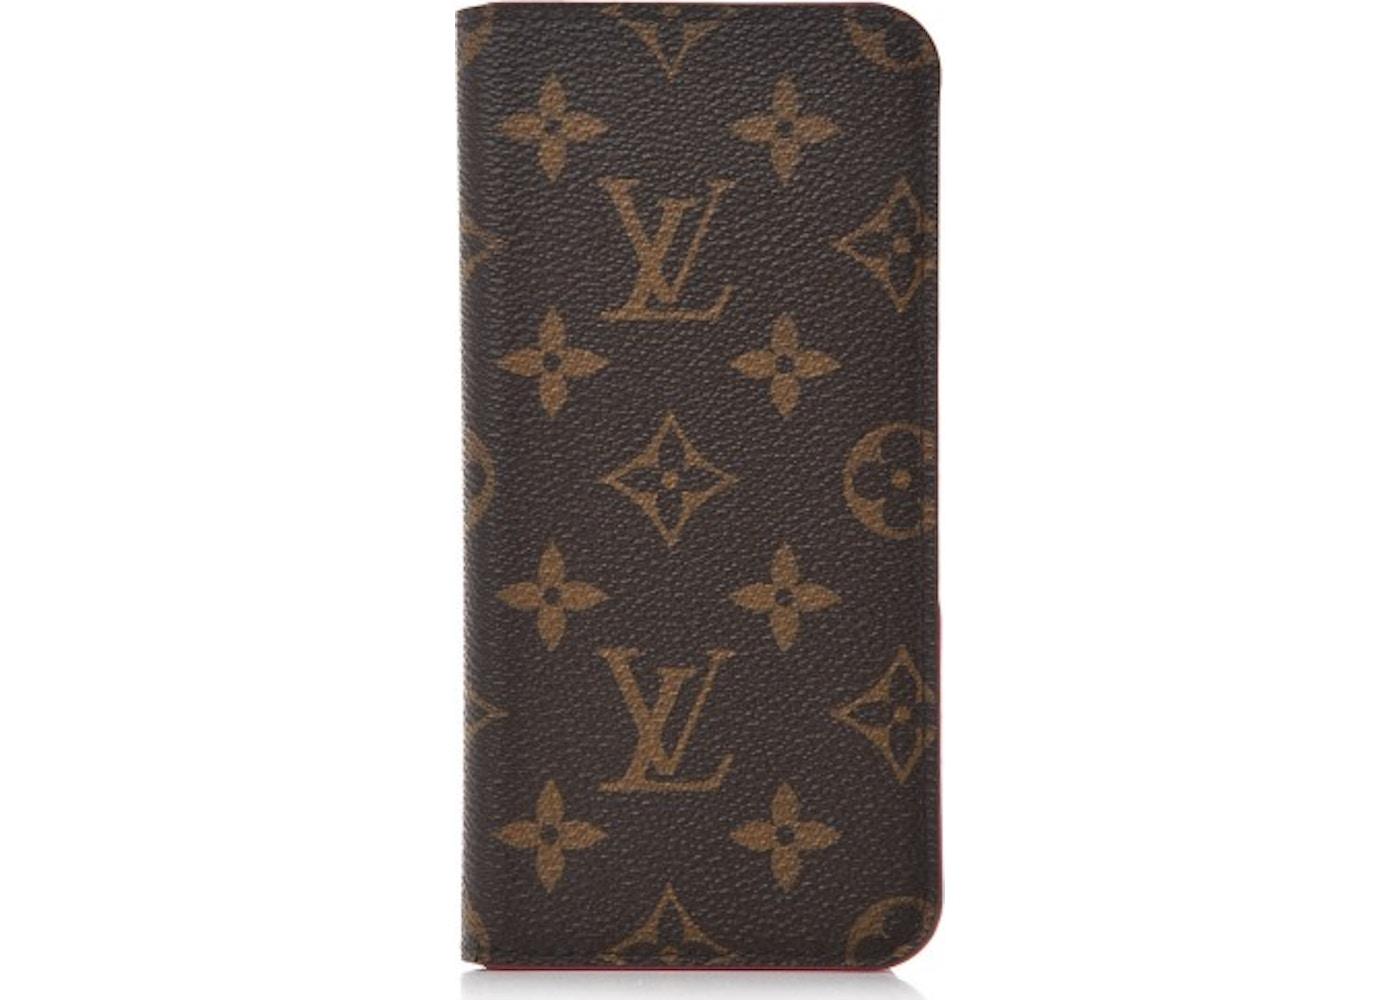 finest selection 9ed11 2b7b0 Louis Vuitton Folio Case iPhone 7/8 Plus Monogram Rose Pink